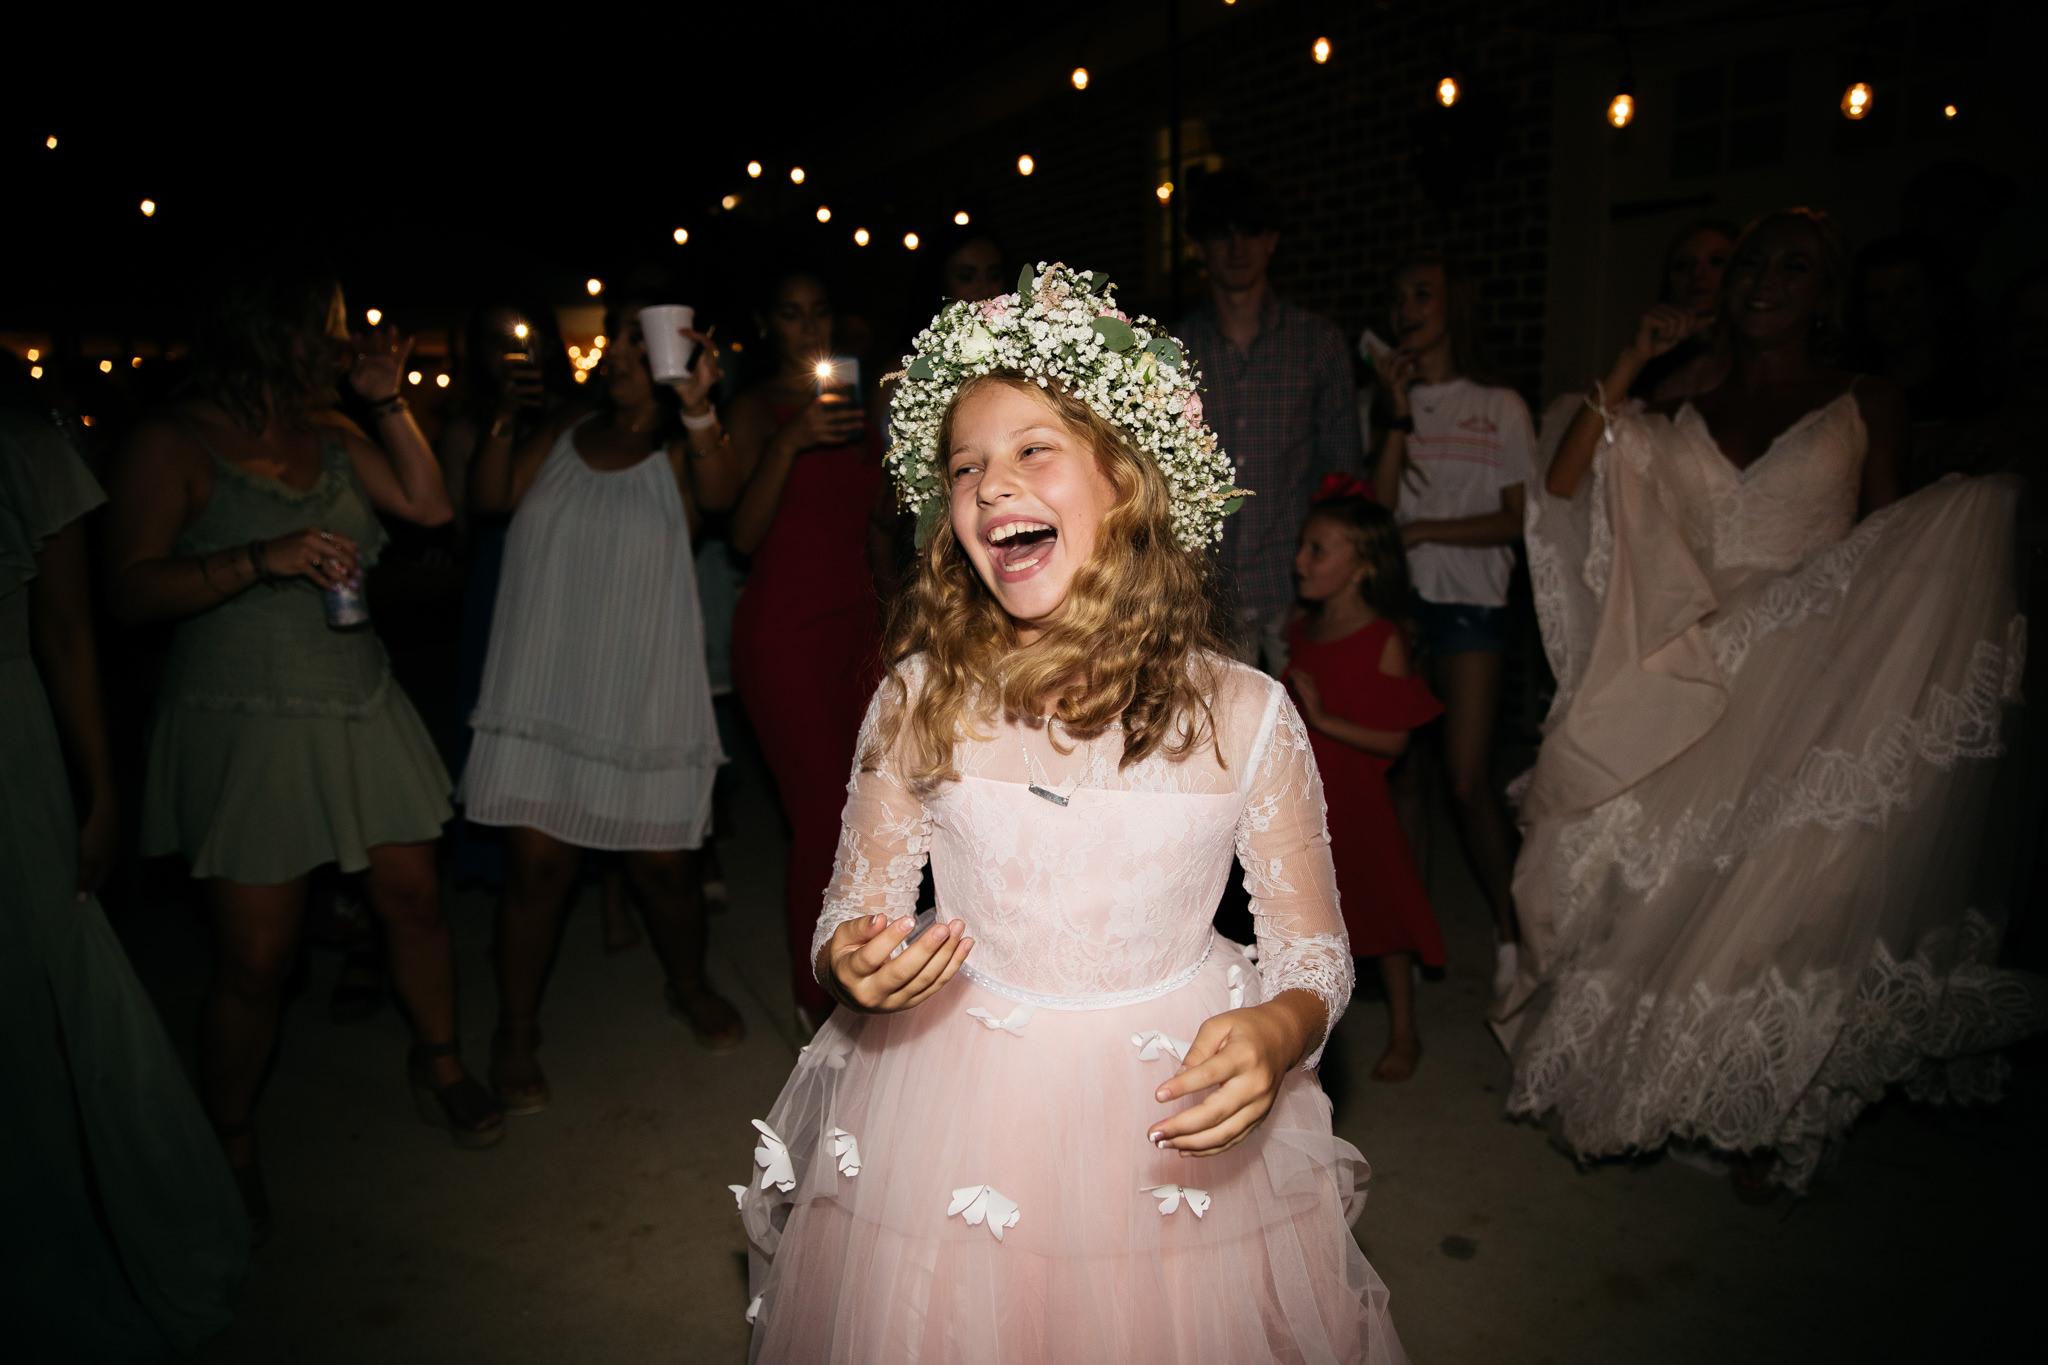 backyard-wedding-thewarmtharoundyou-lexy-branson-86.jpg